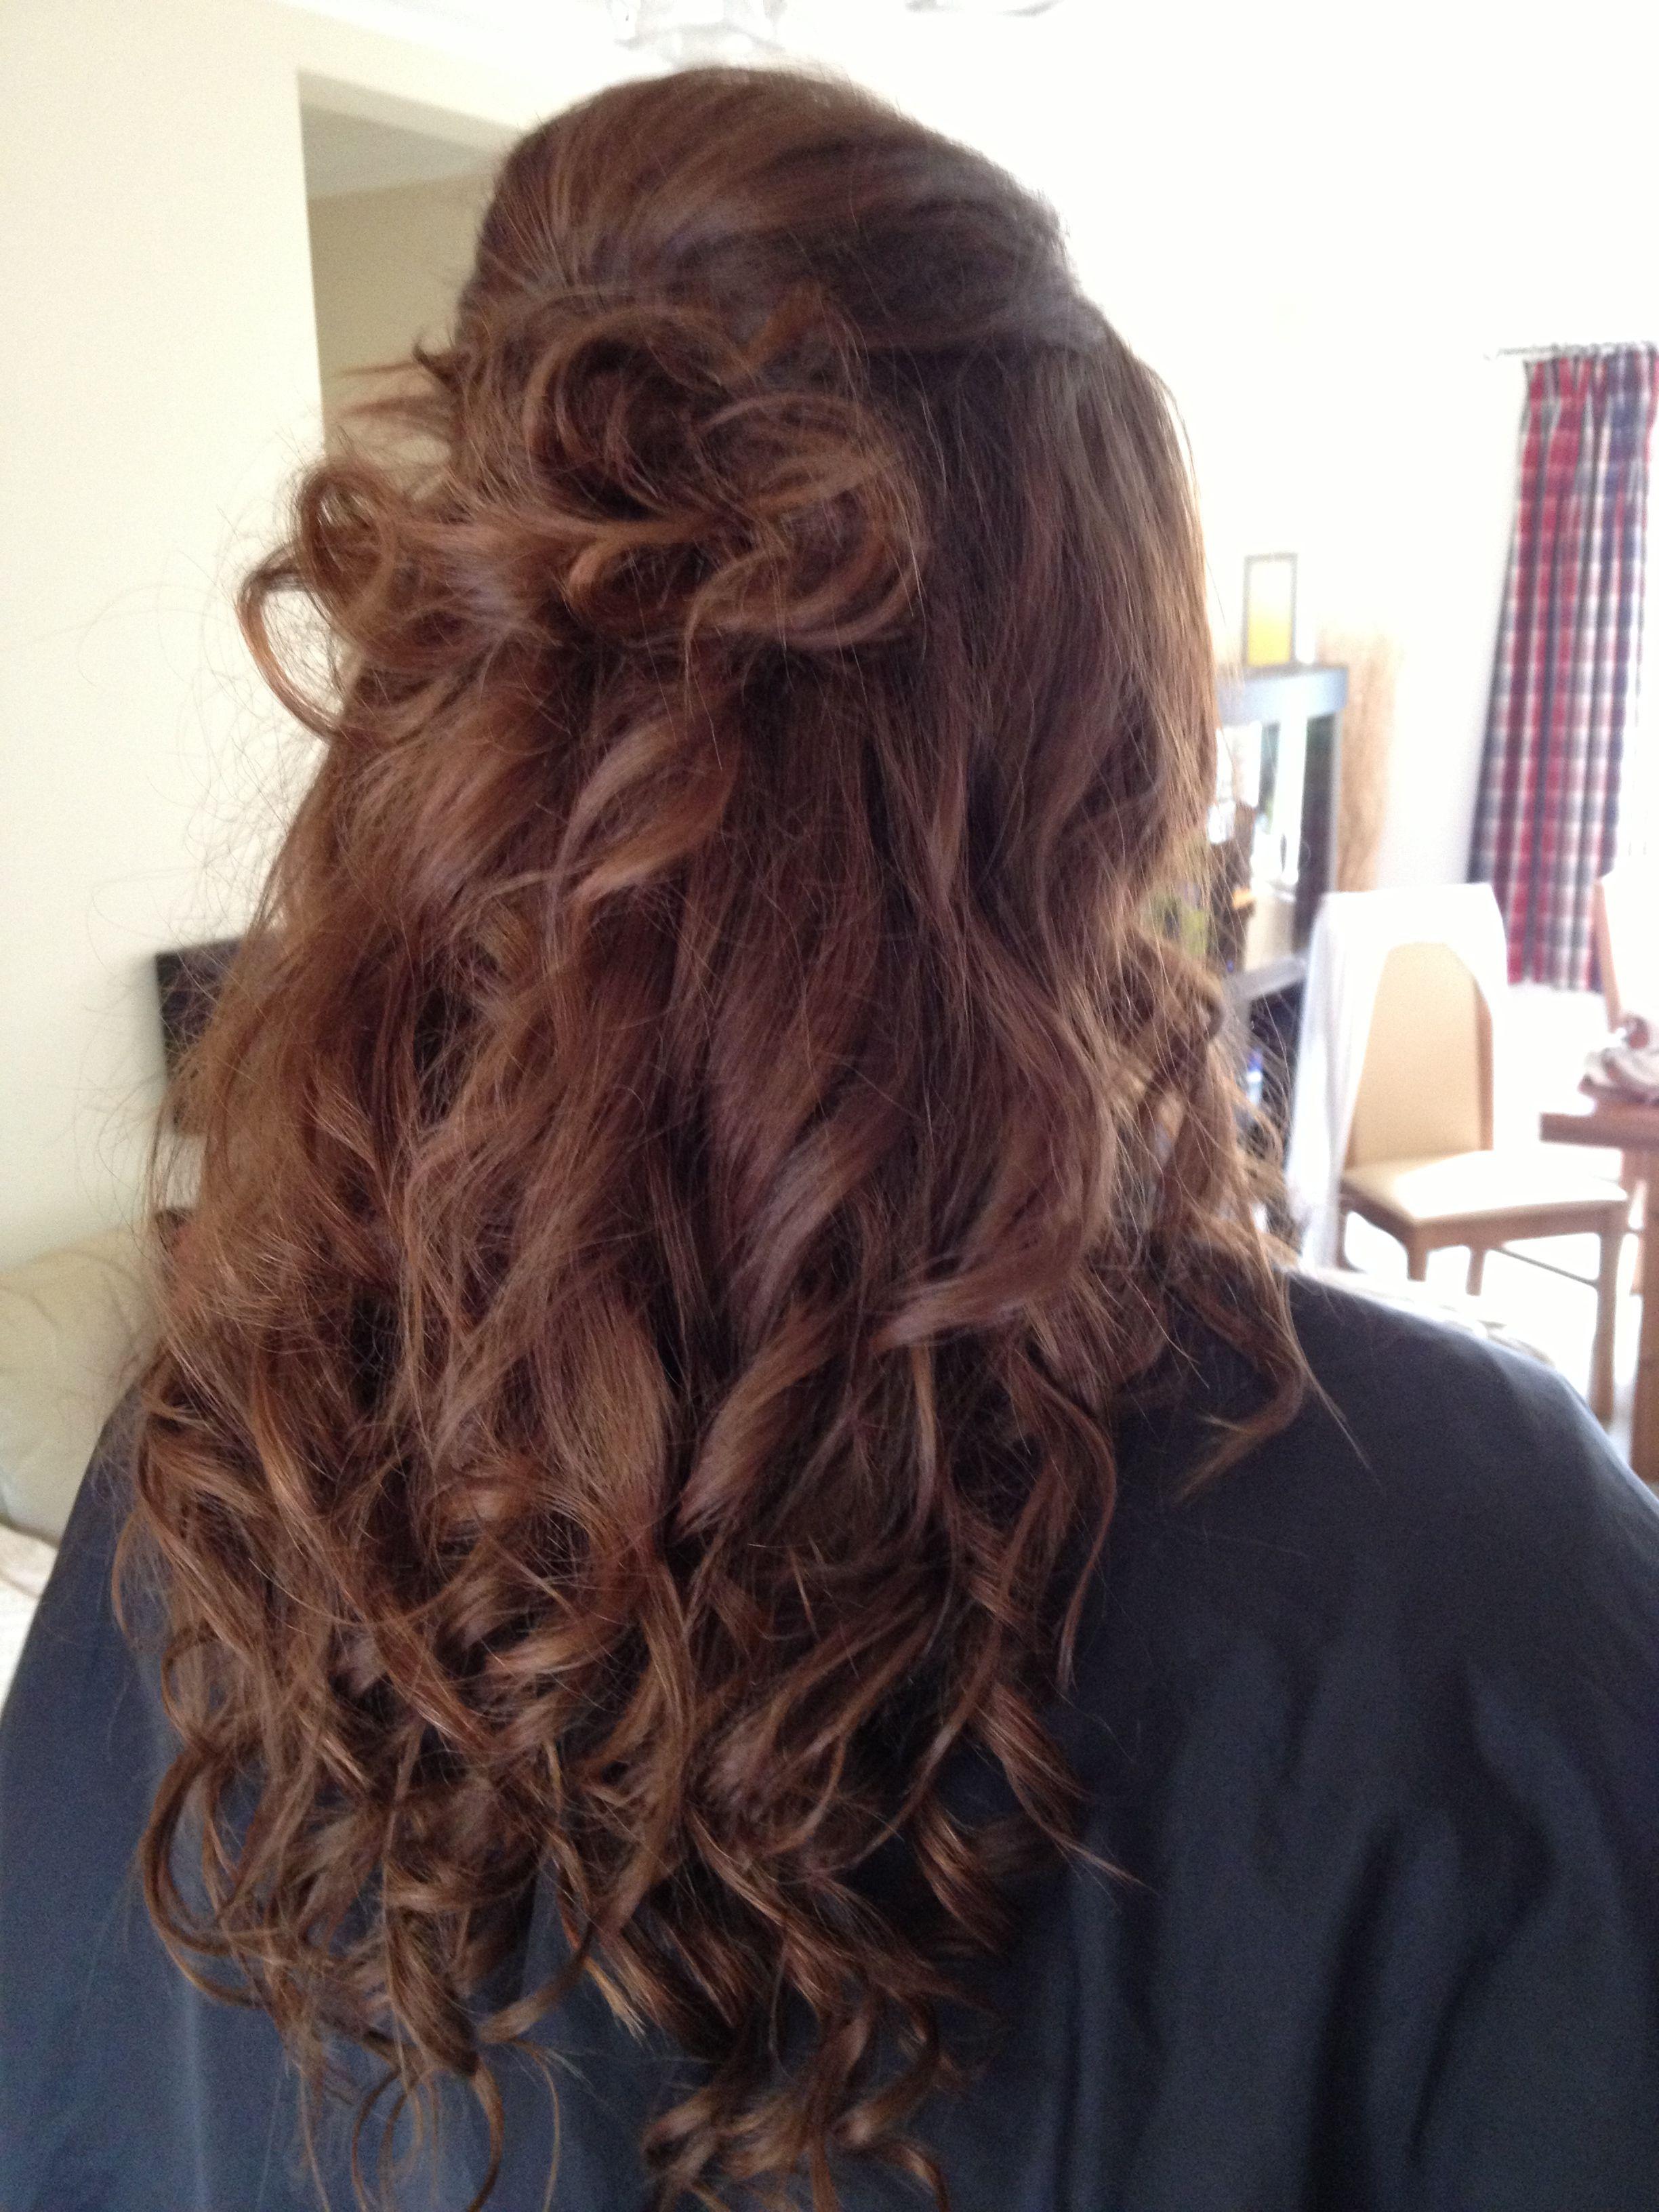 Half up half down wedding hair curls extensions